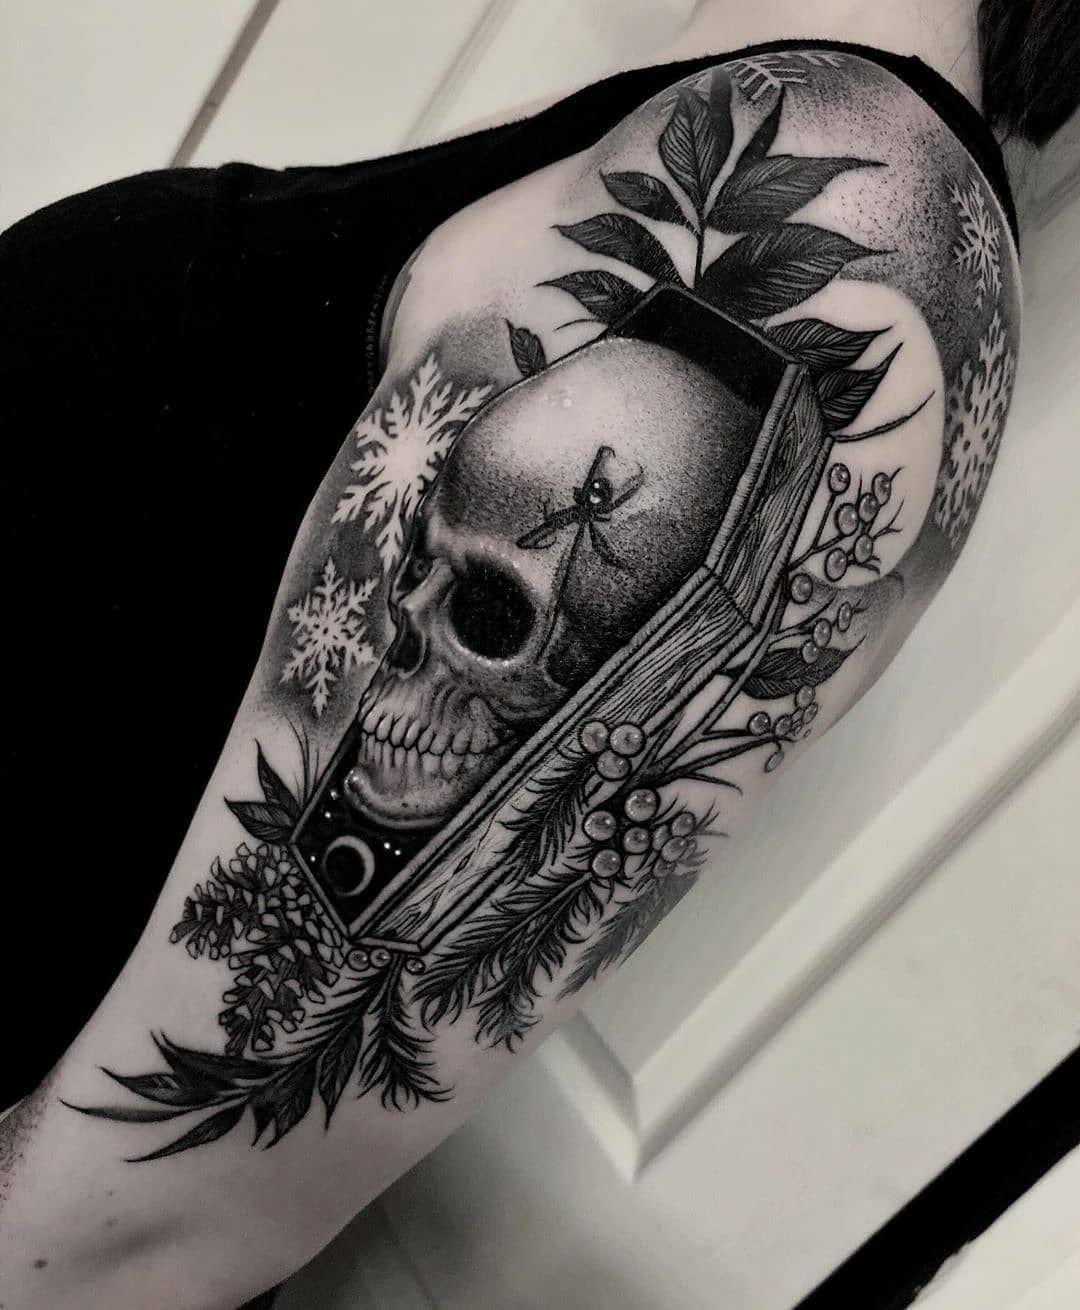 Tattoo Photo Gallery : tattoo, photo, gallery, Tattoo, World, Gallery, Tattoos,, Tattoo,, Tattoos